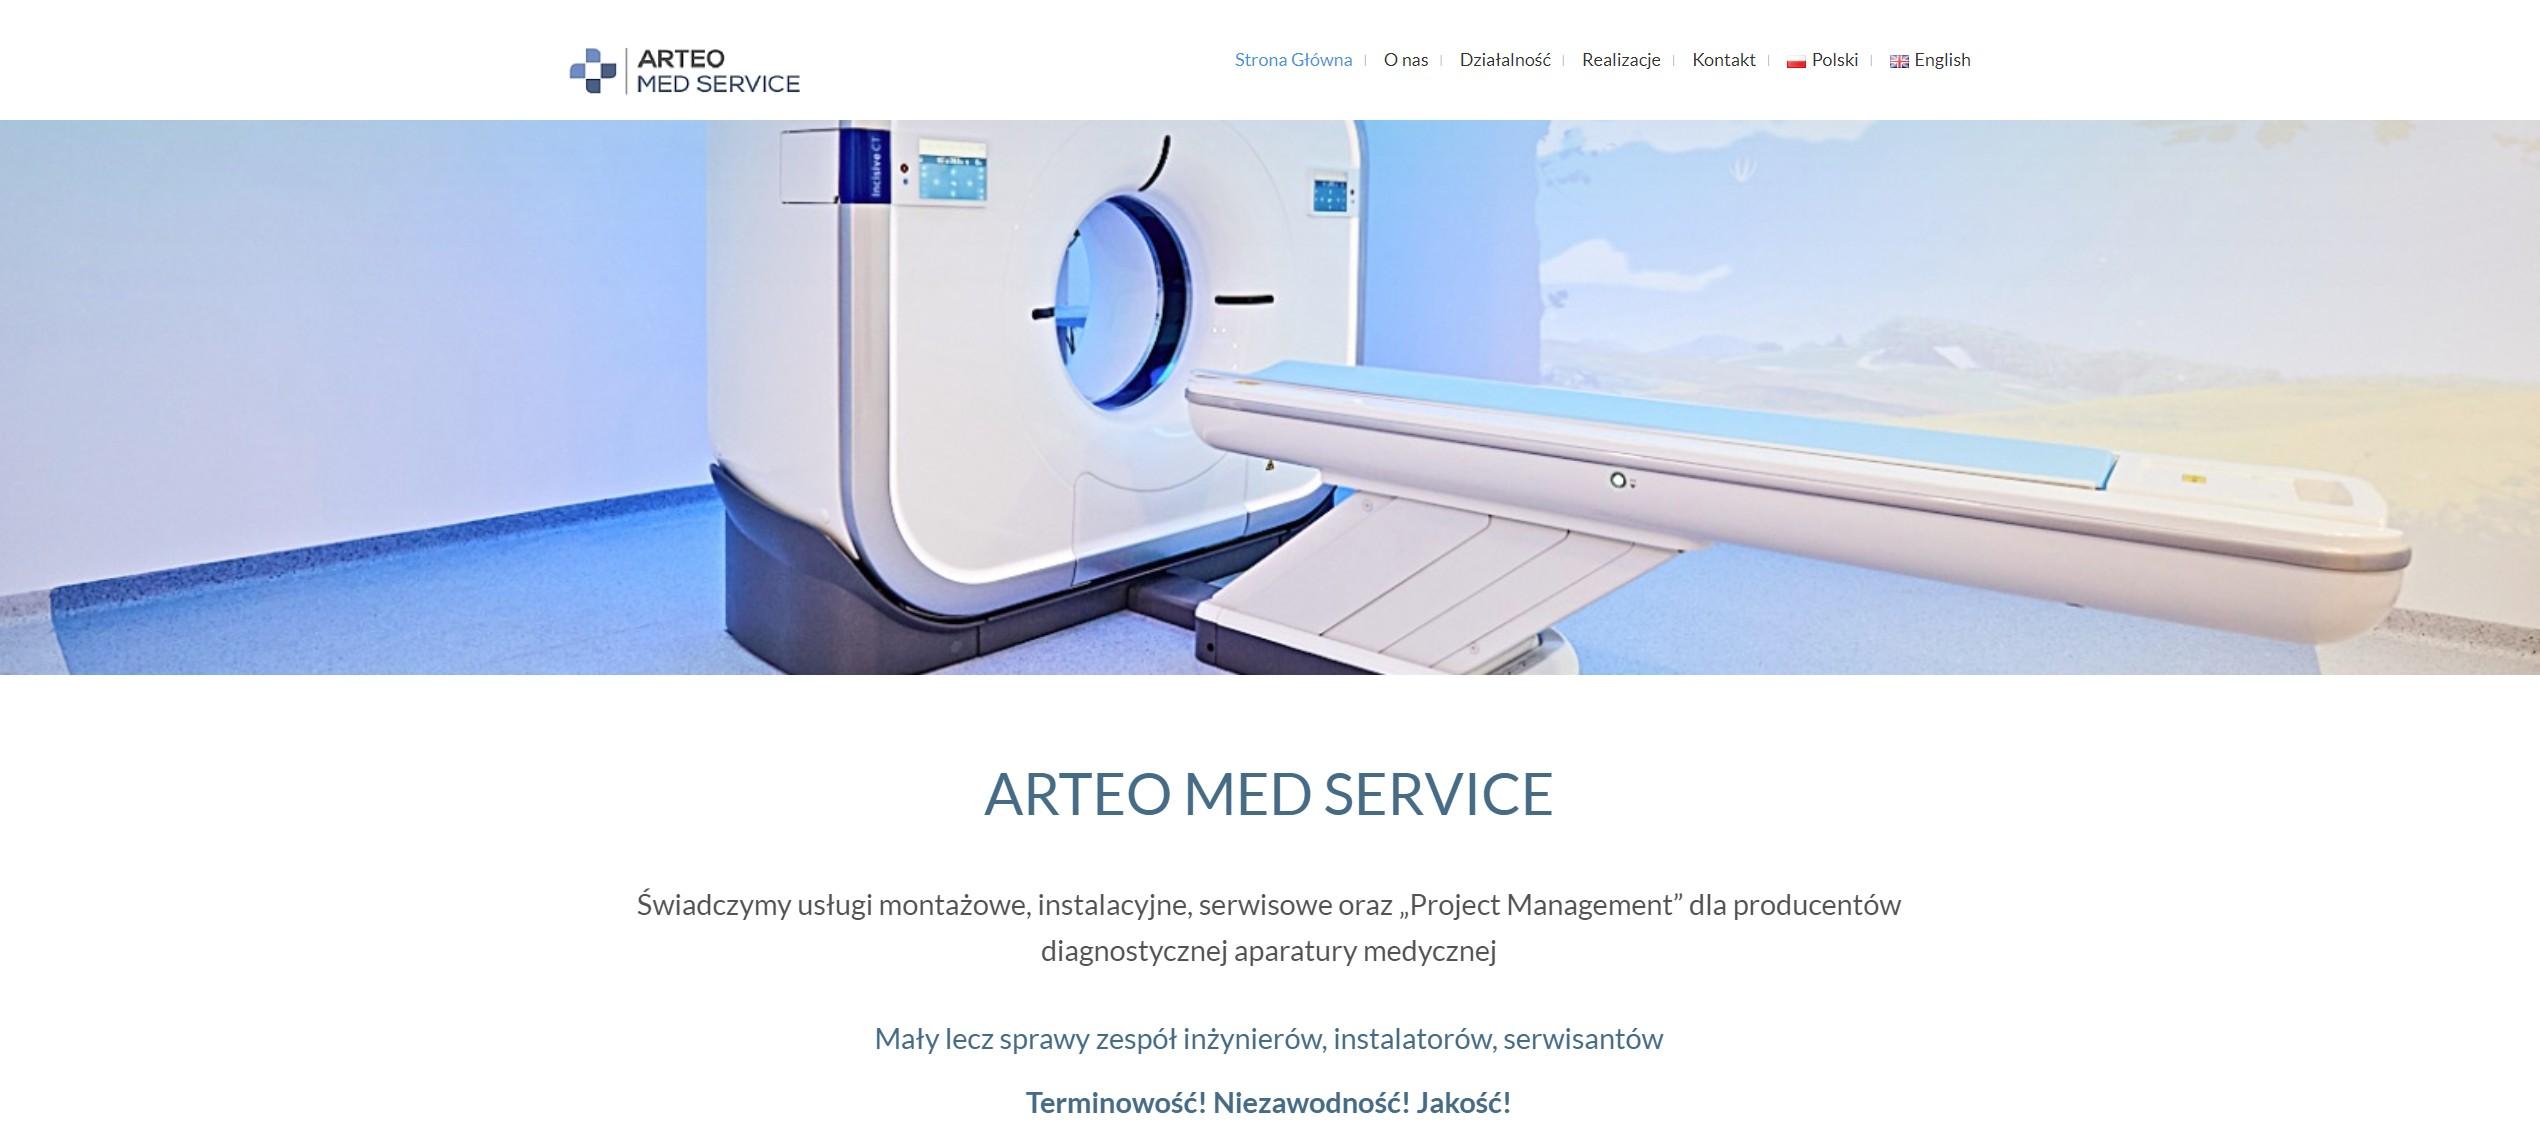 Arteo Med Service